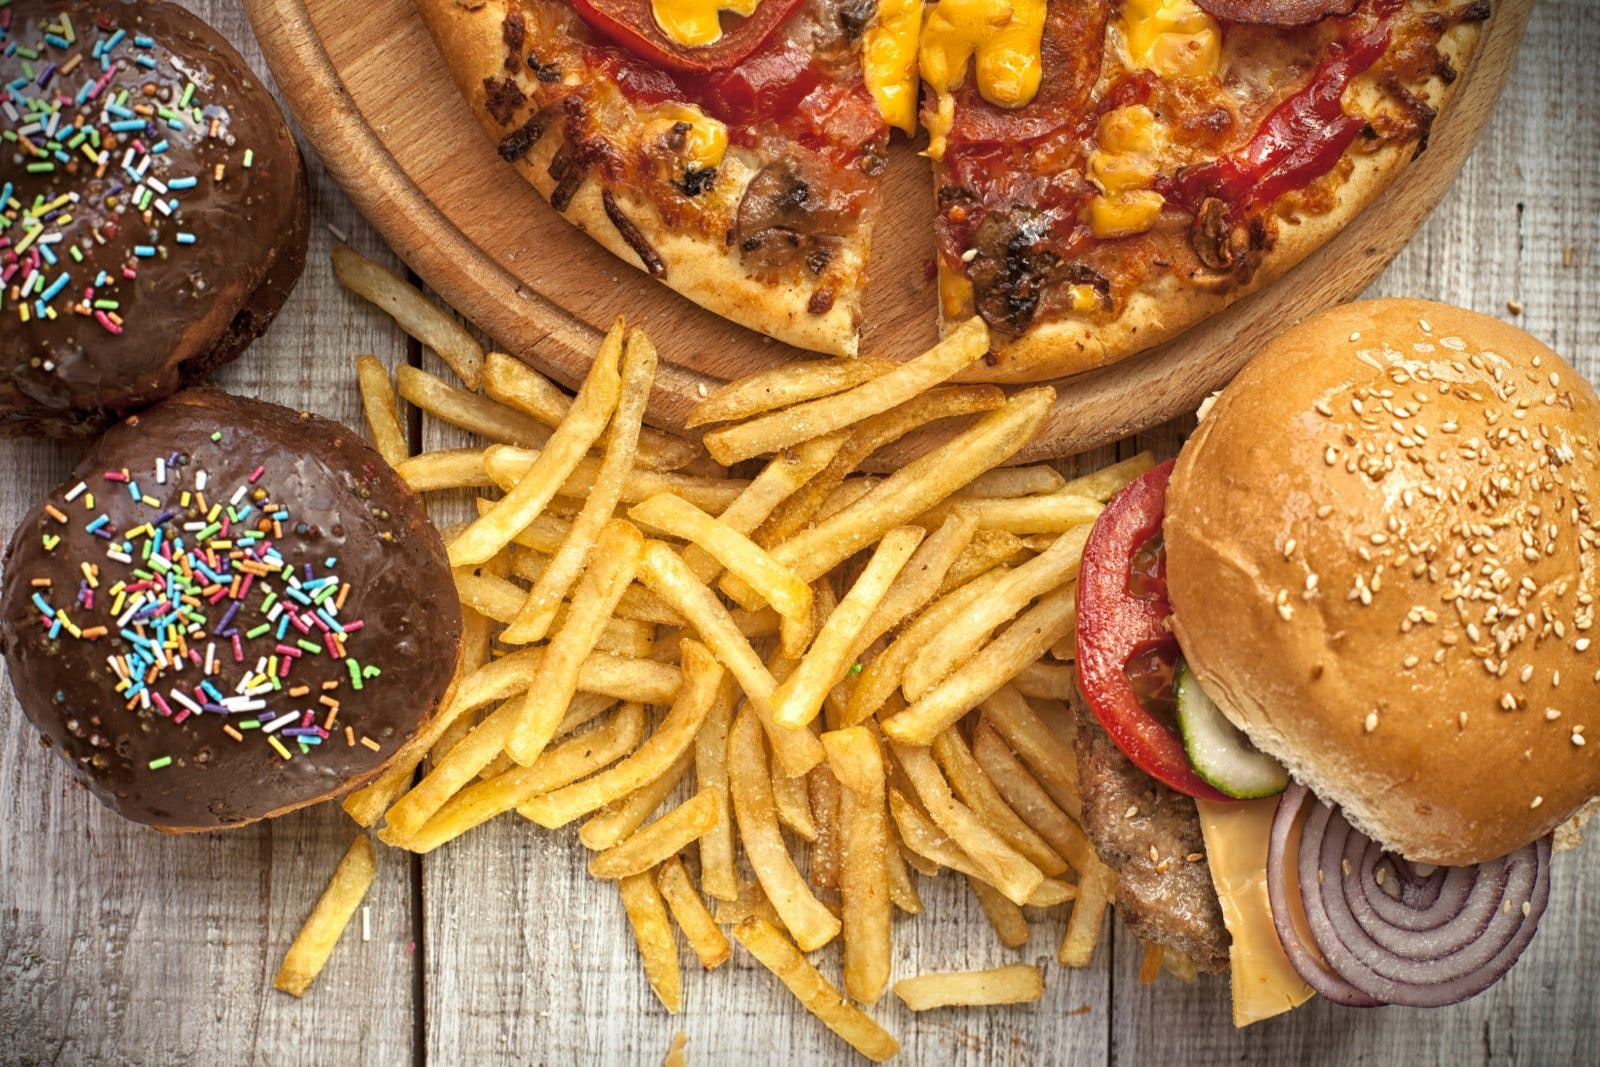 Fast-food-set-000066228129_Large-1600x1067